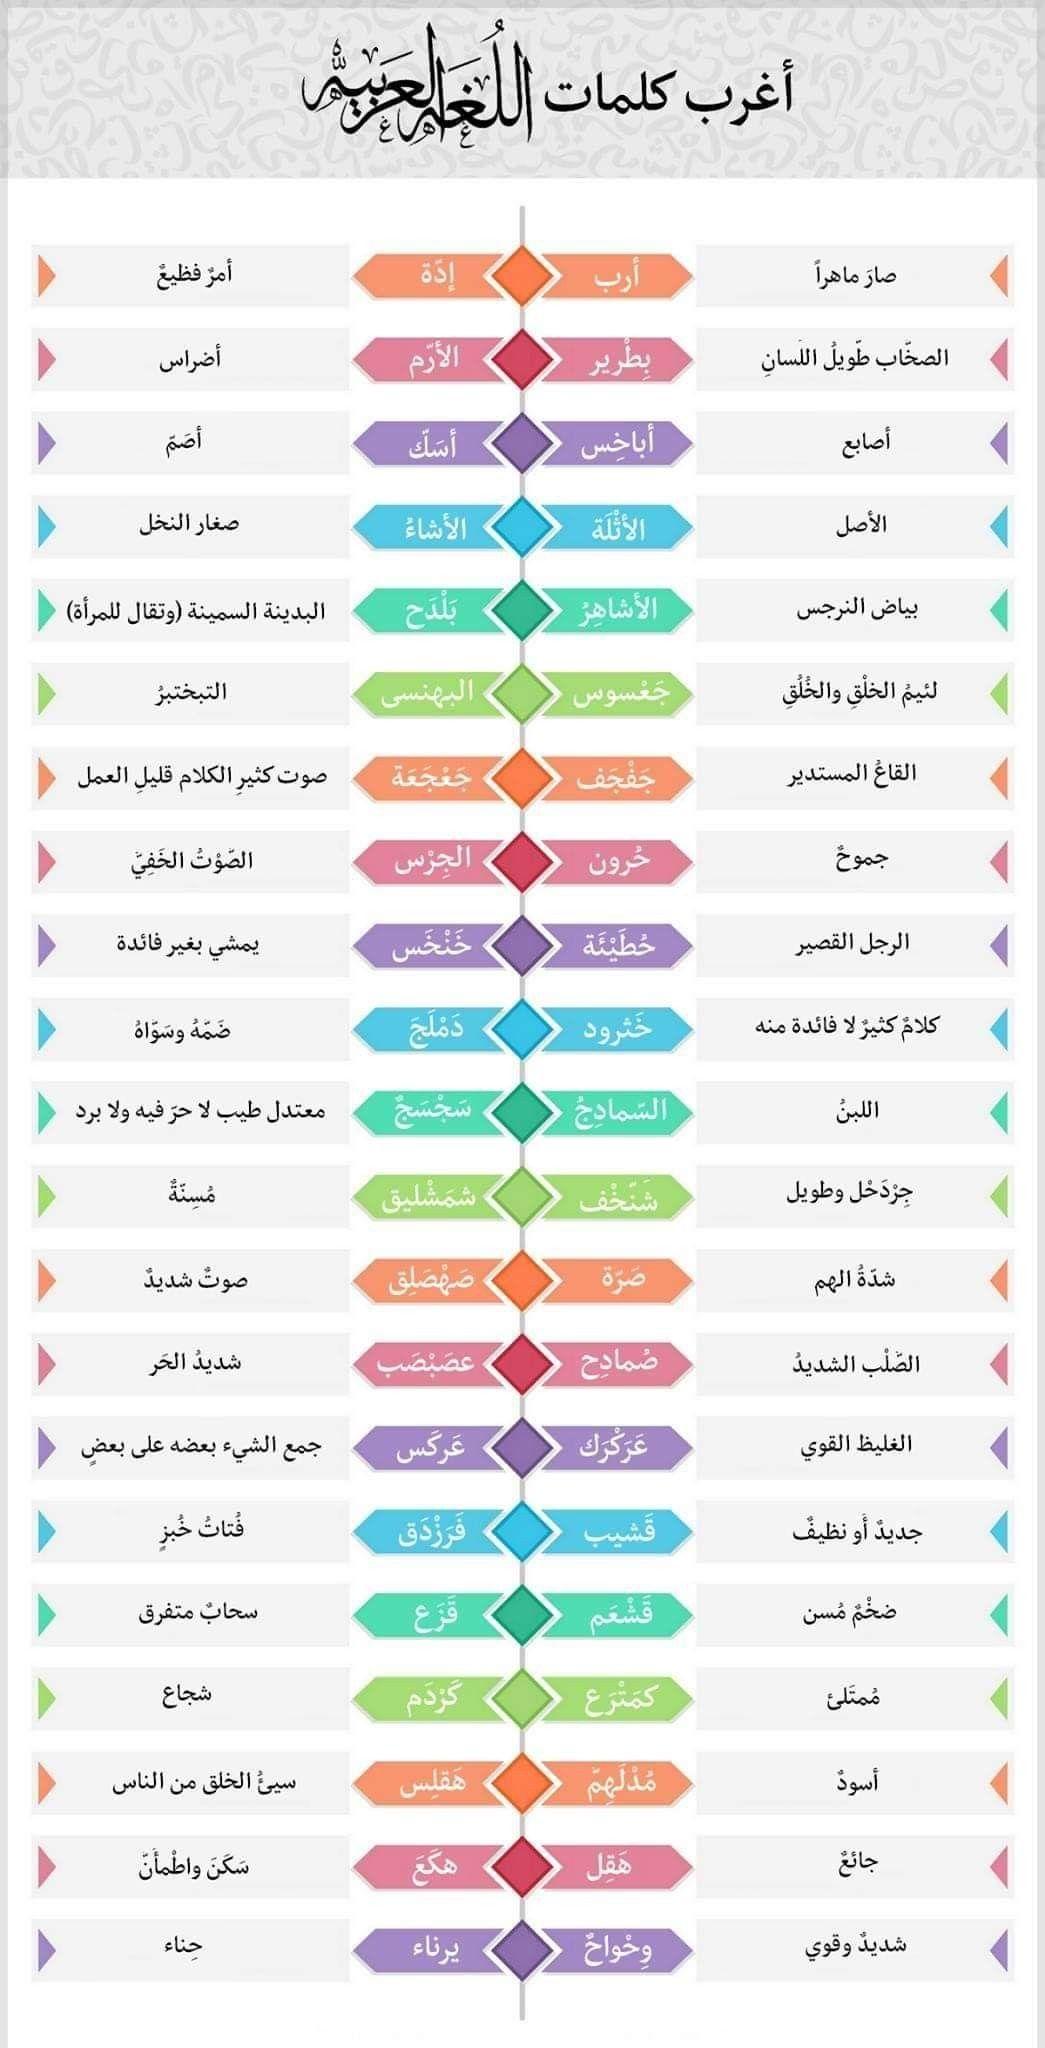 Pin By Manal Titania On لغتي يا لغة الامجاد Learn Arabic Language Arabic Words Islamic Phrases